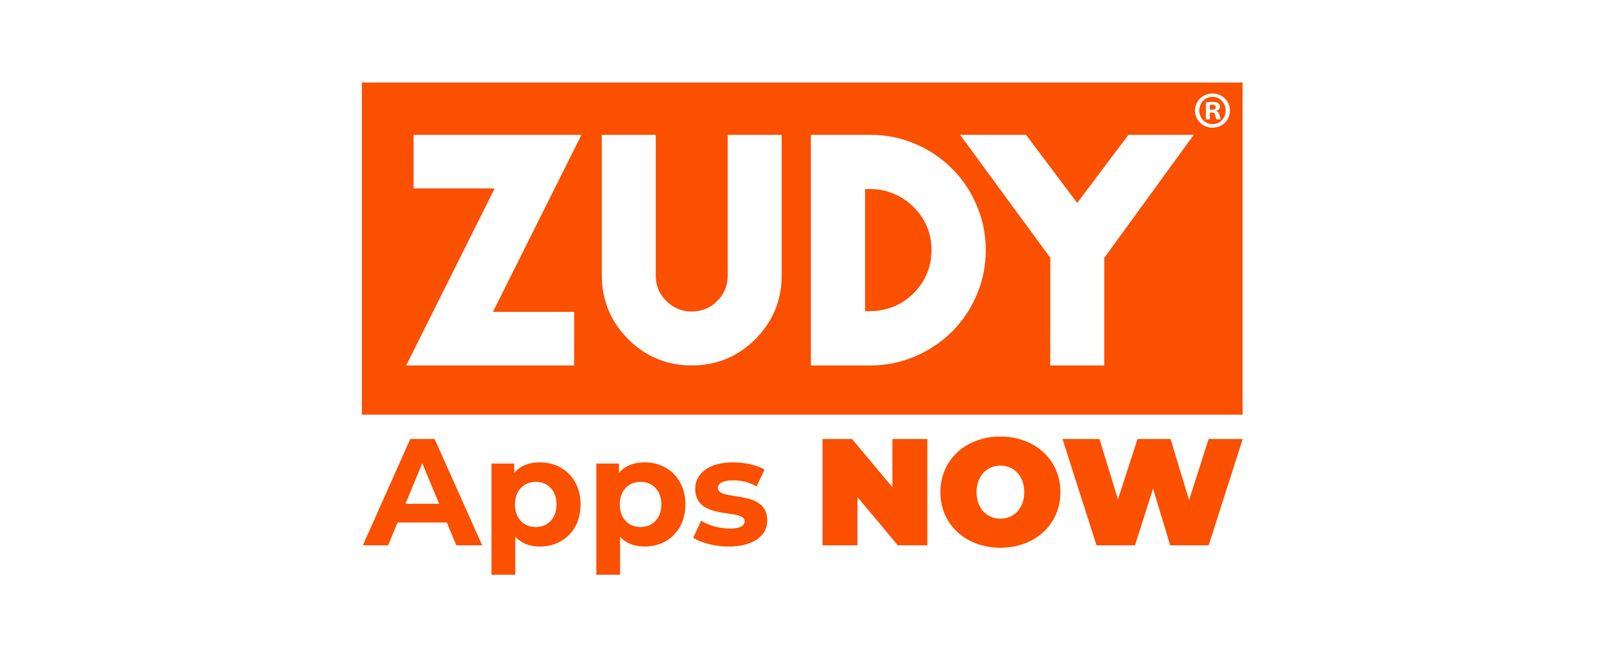 premiere-zudy-apps-now-logo